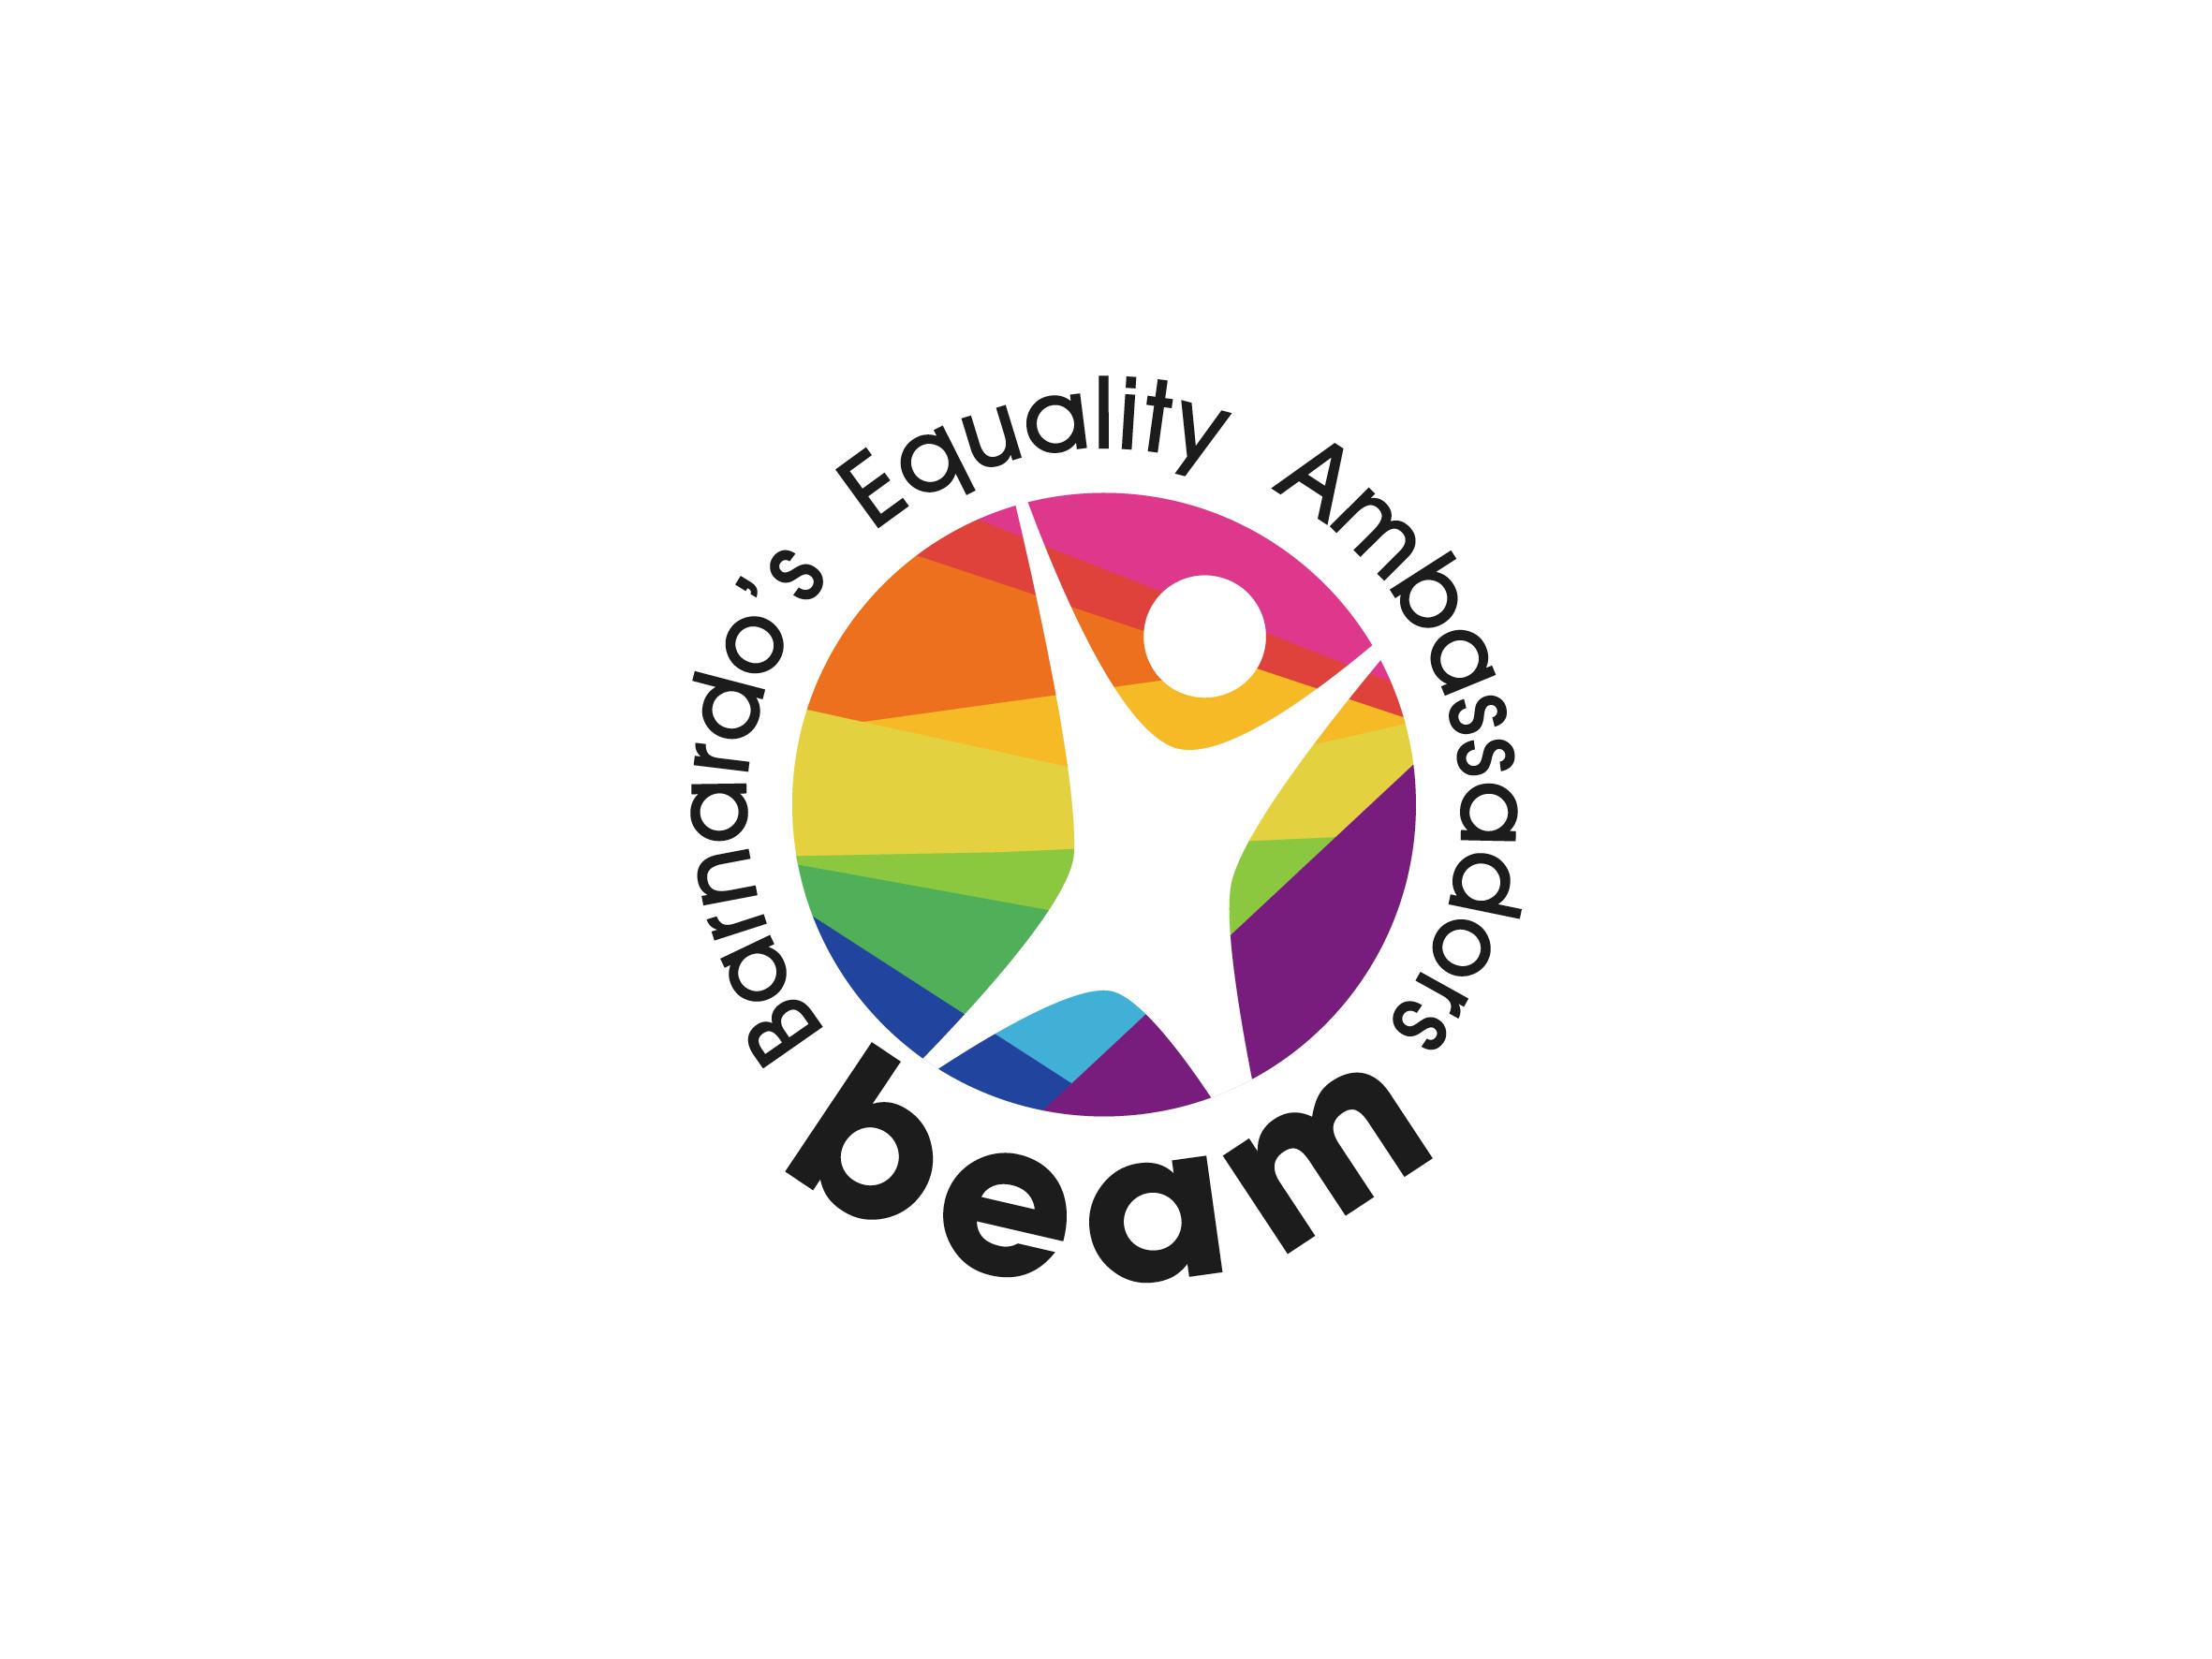 beam barnardos equality ambassadors logo design designed by Dakini Design Saltaire, Shipley, Bradford